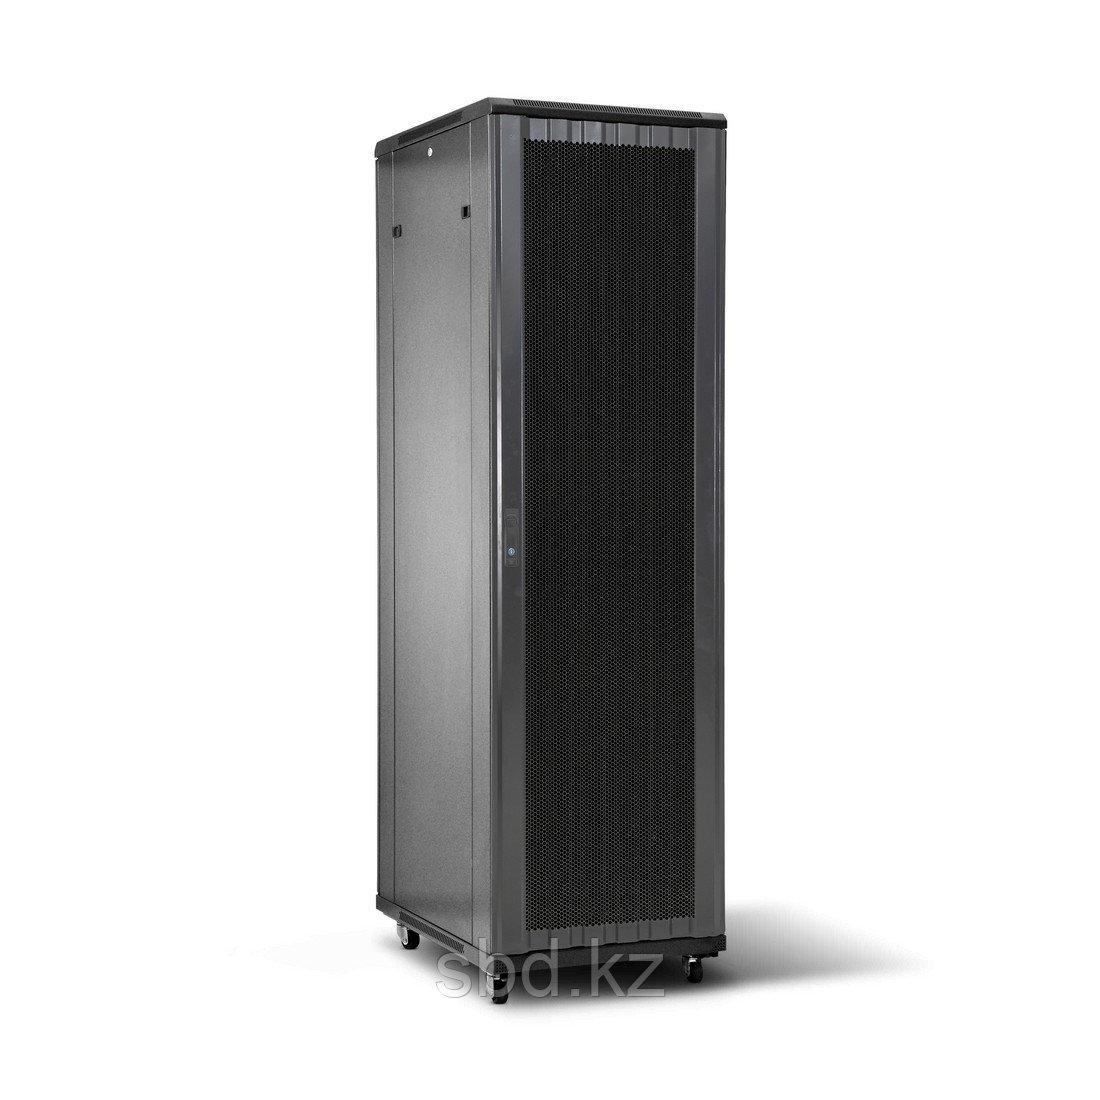 Шкаф серверный SHIP 601.8047.55.100 47U 800*1000*2200 мм